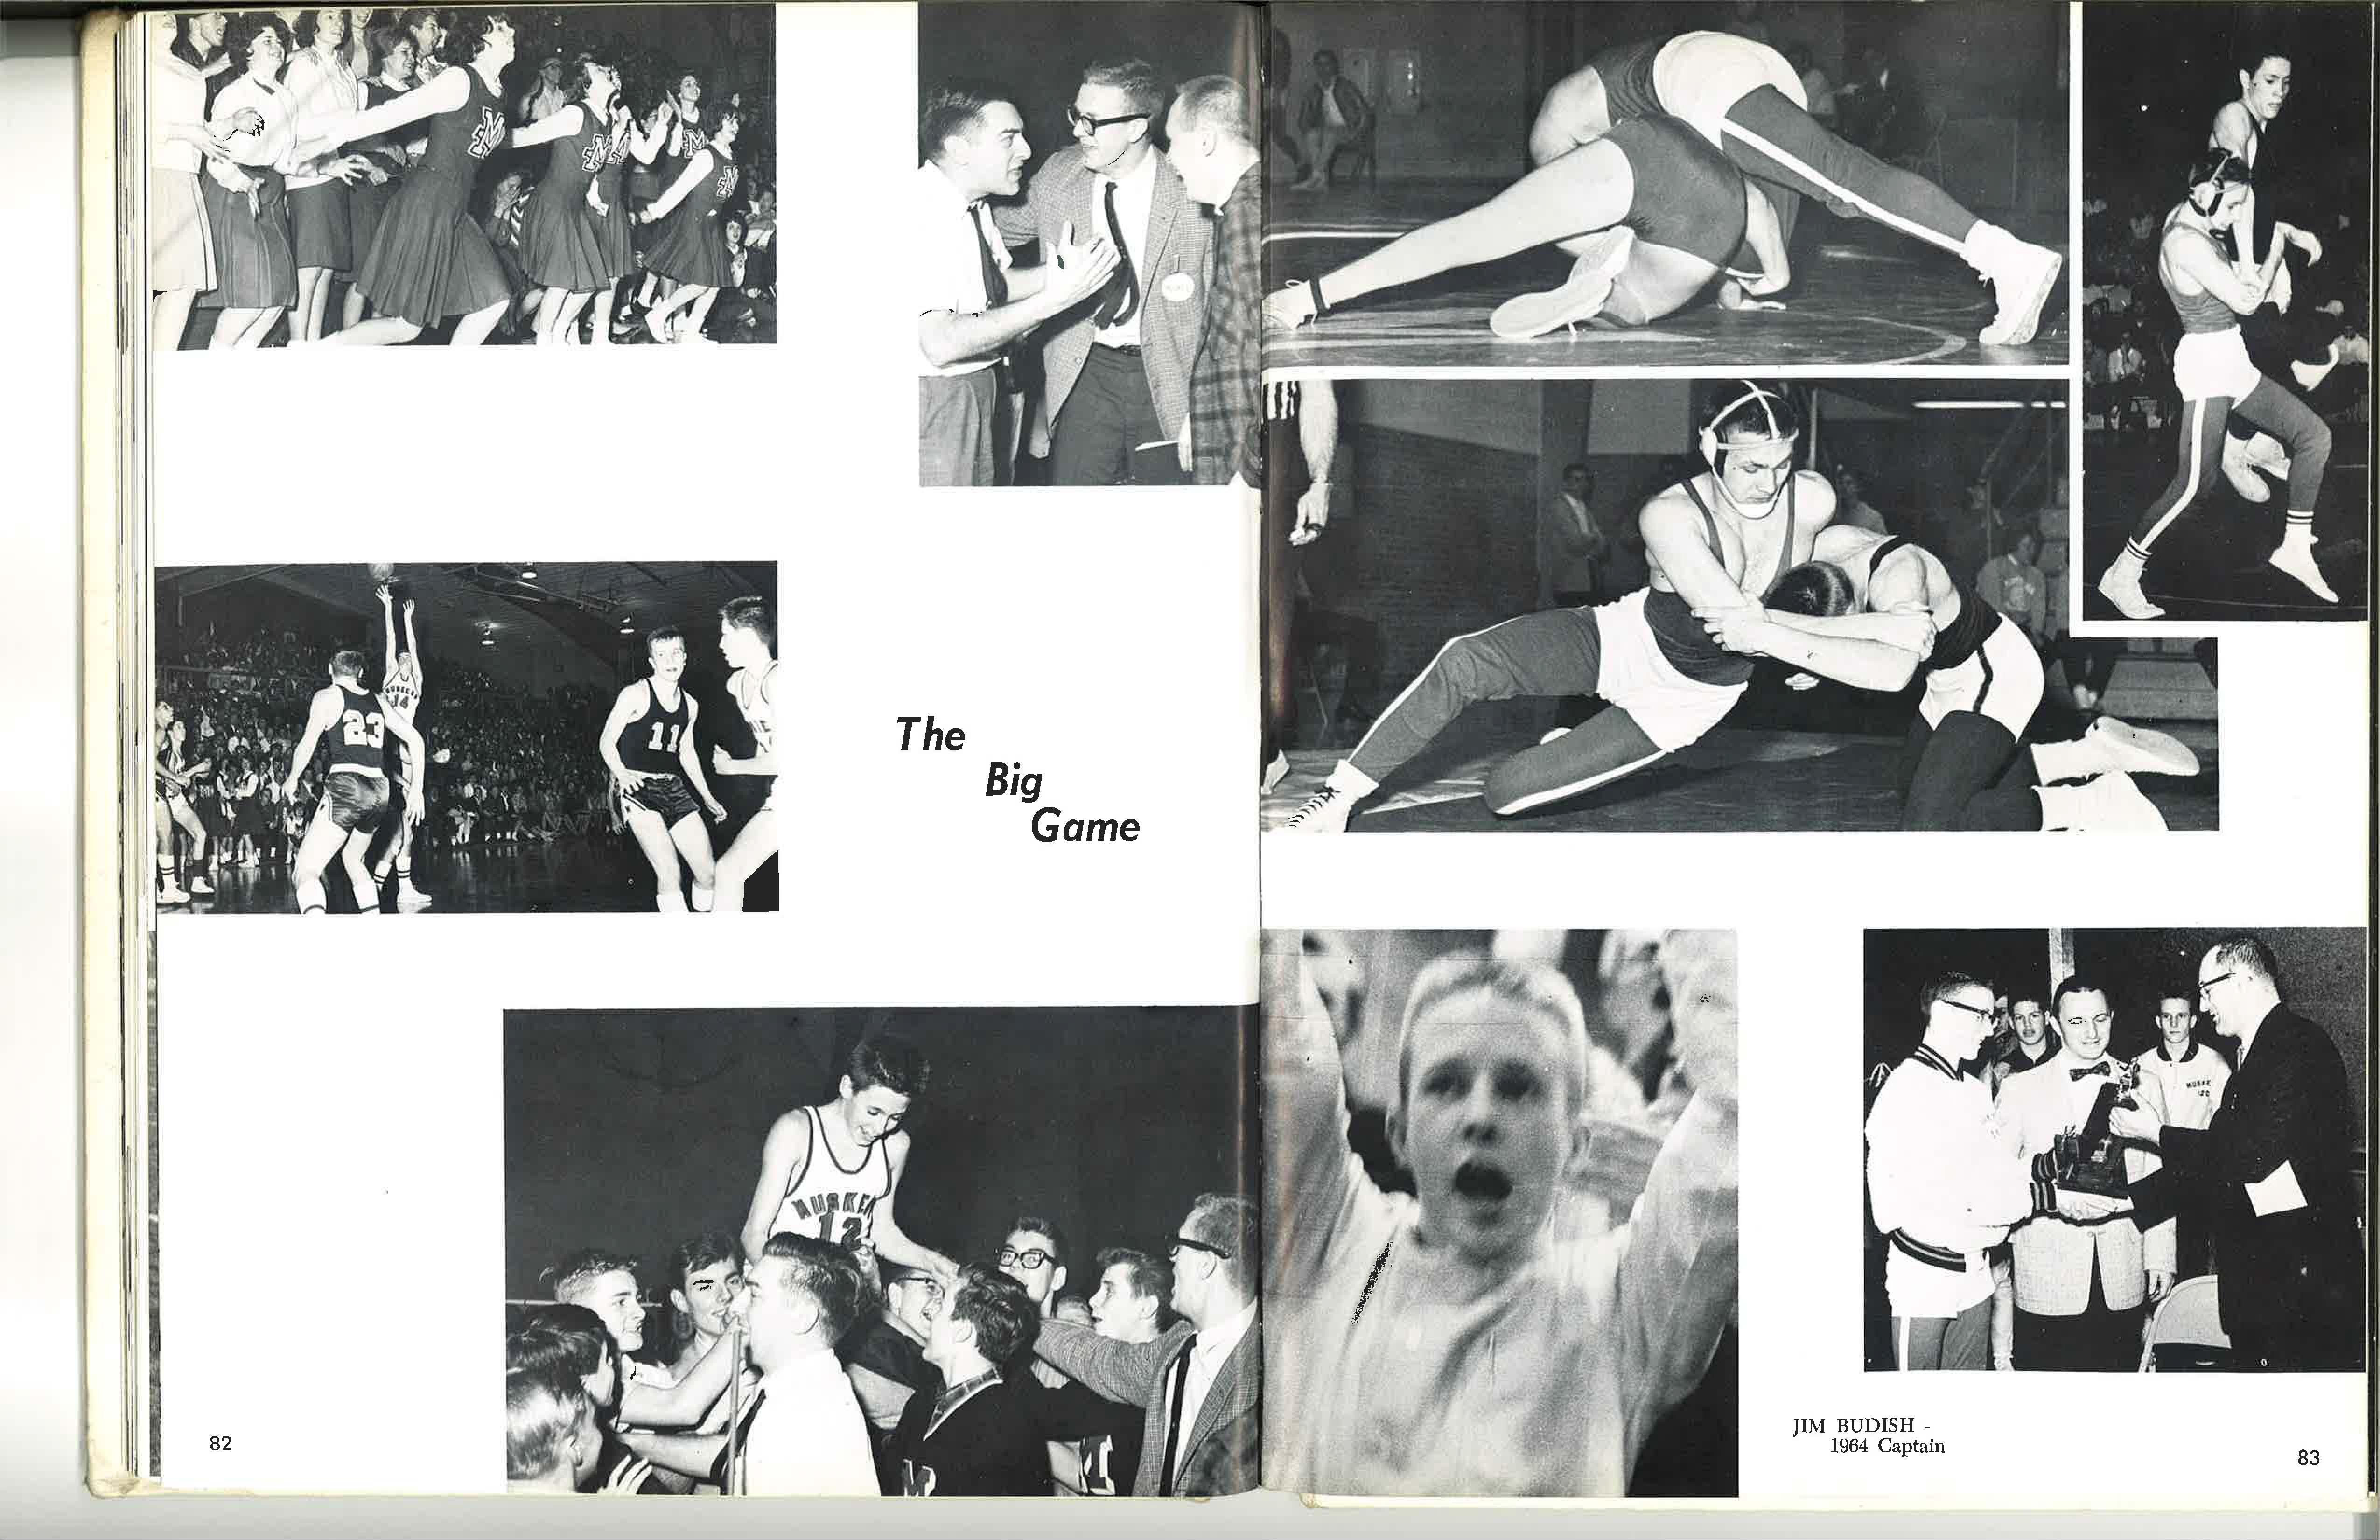 1964_Yearbook_Athletics_82-83.jpg